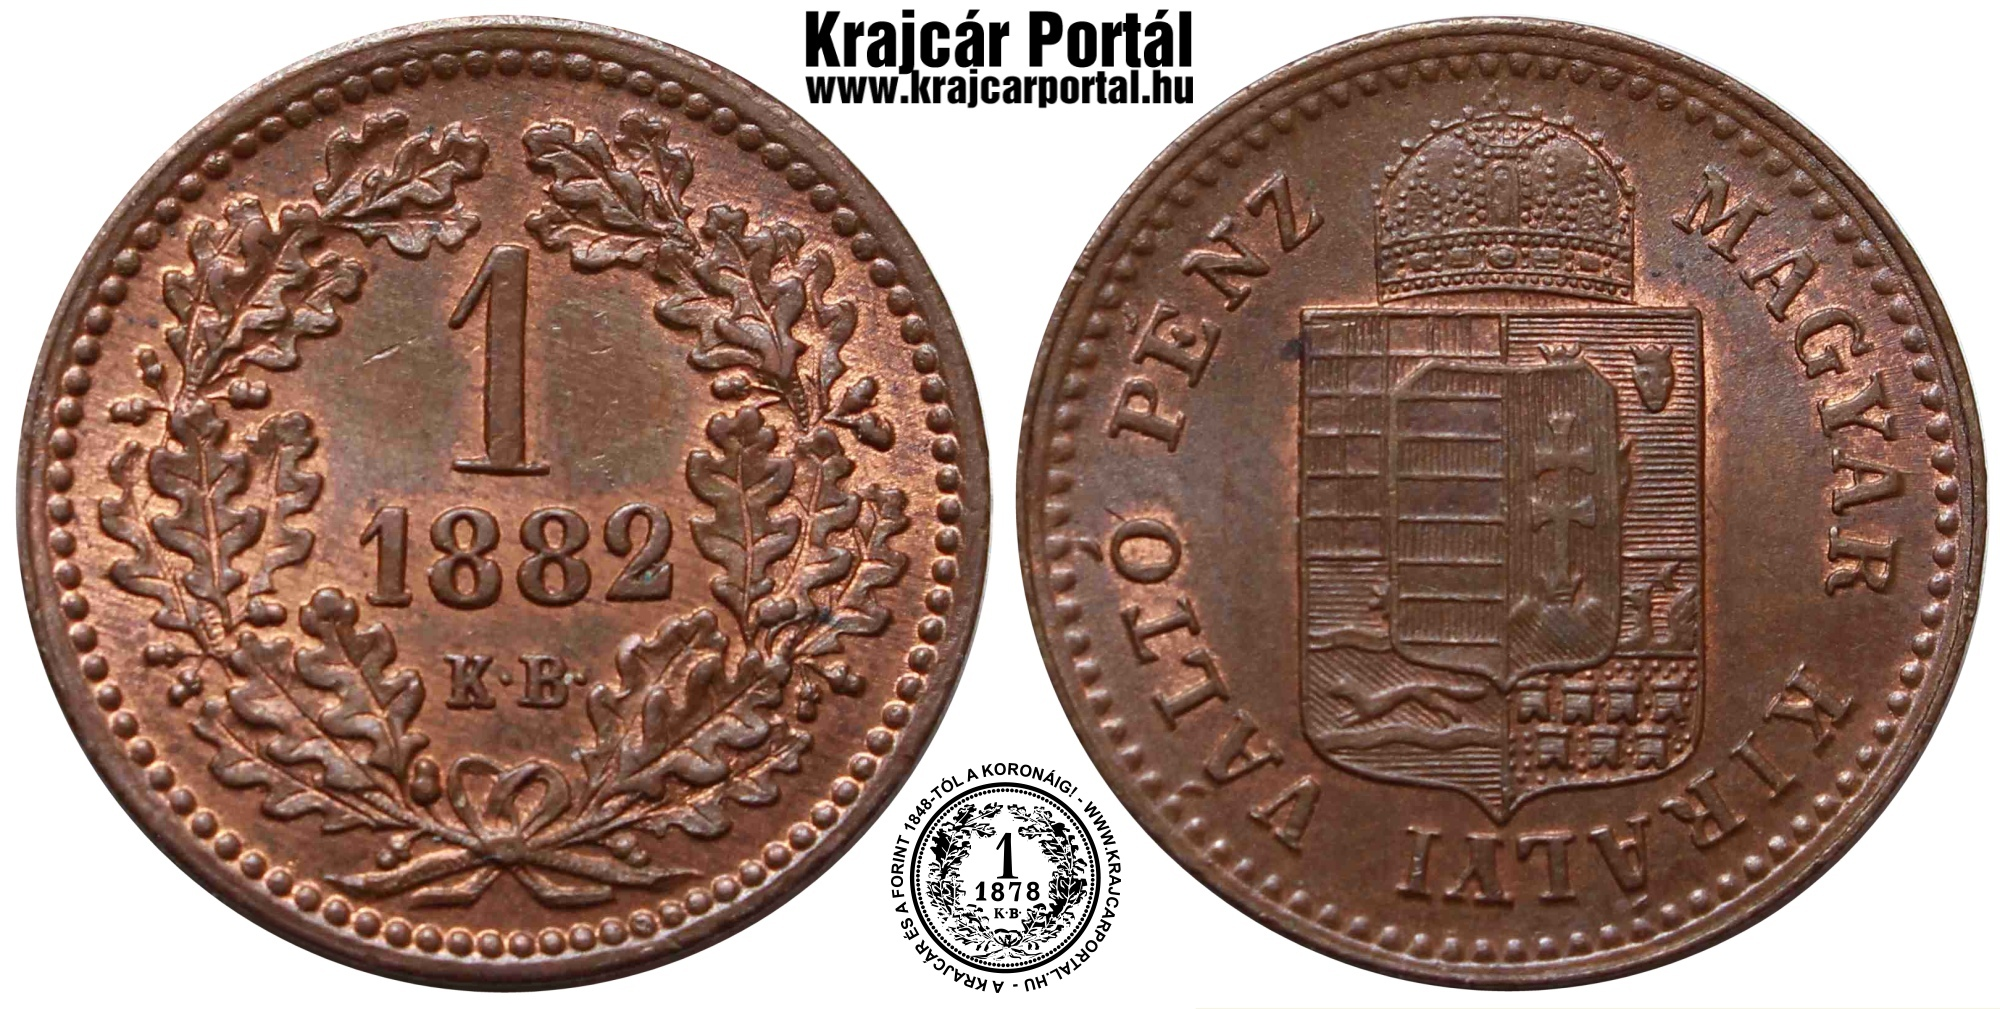 http://www.krajcarportal.hu/ferencjozsef/1_krajcar/www_krajcarportal_hu_1882_1_krajczar-krajcar.jpg